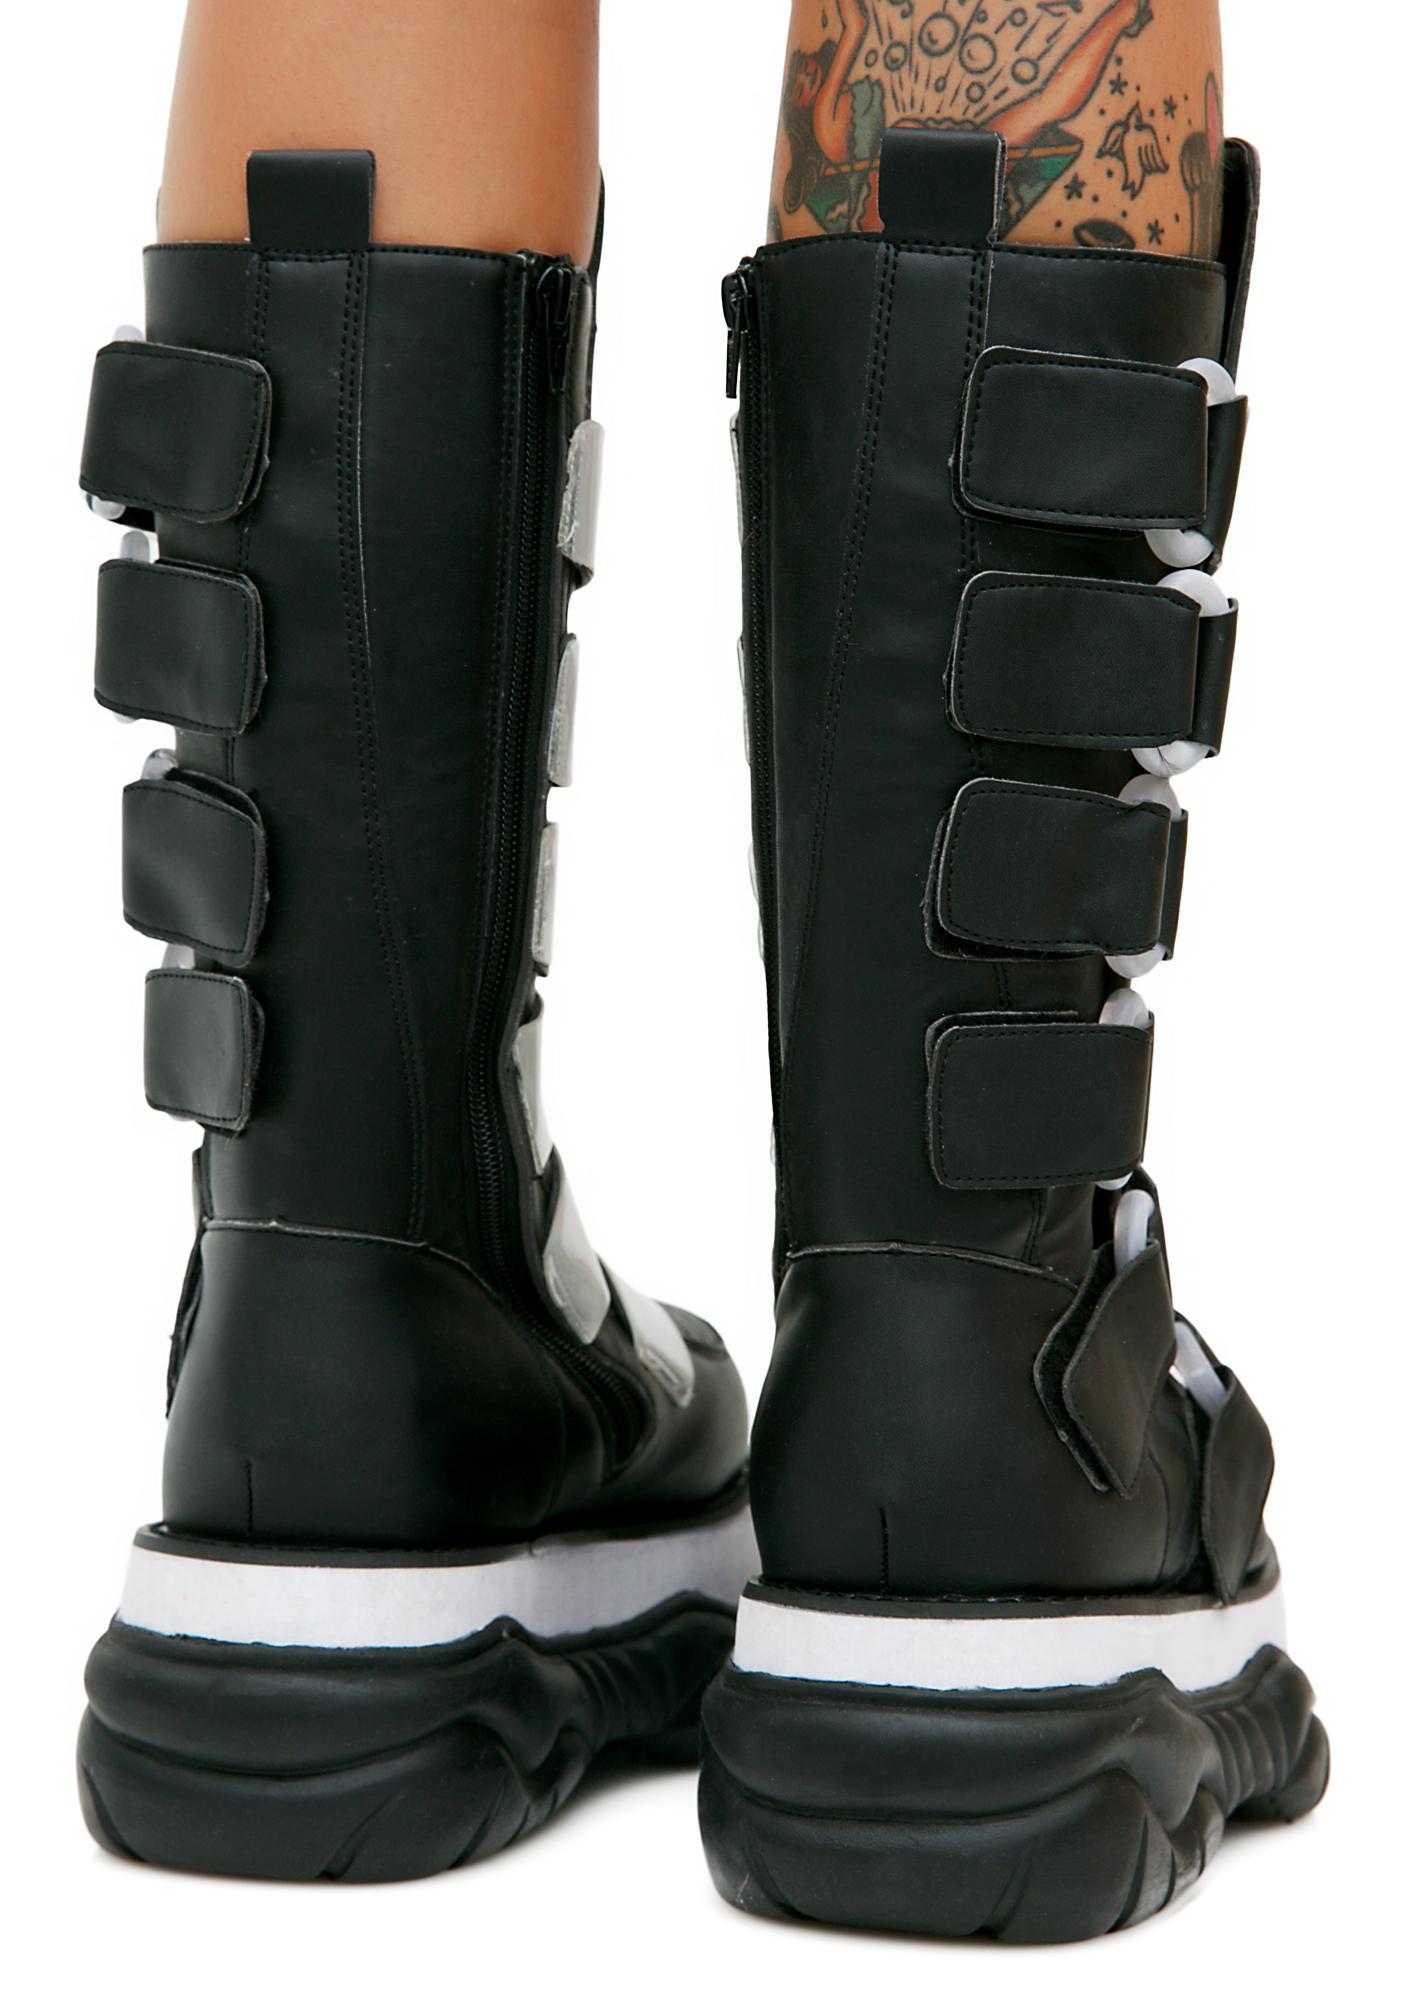 Demonia Cyber Neptune UV Reactive Platform Boots